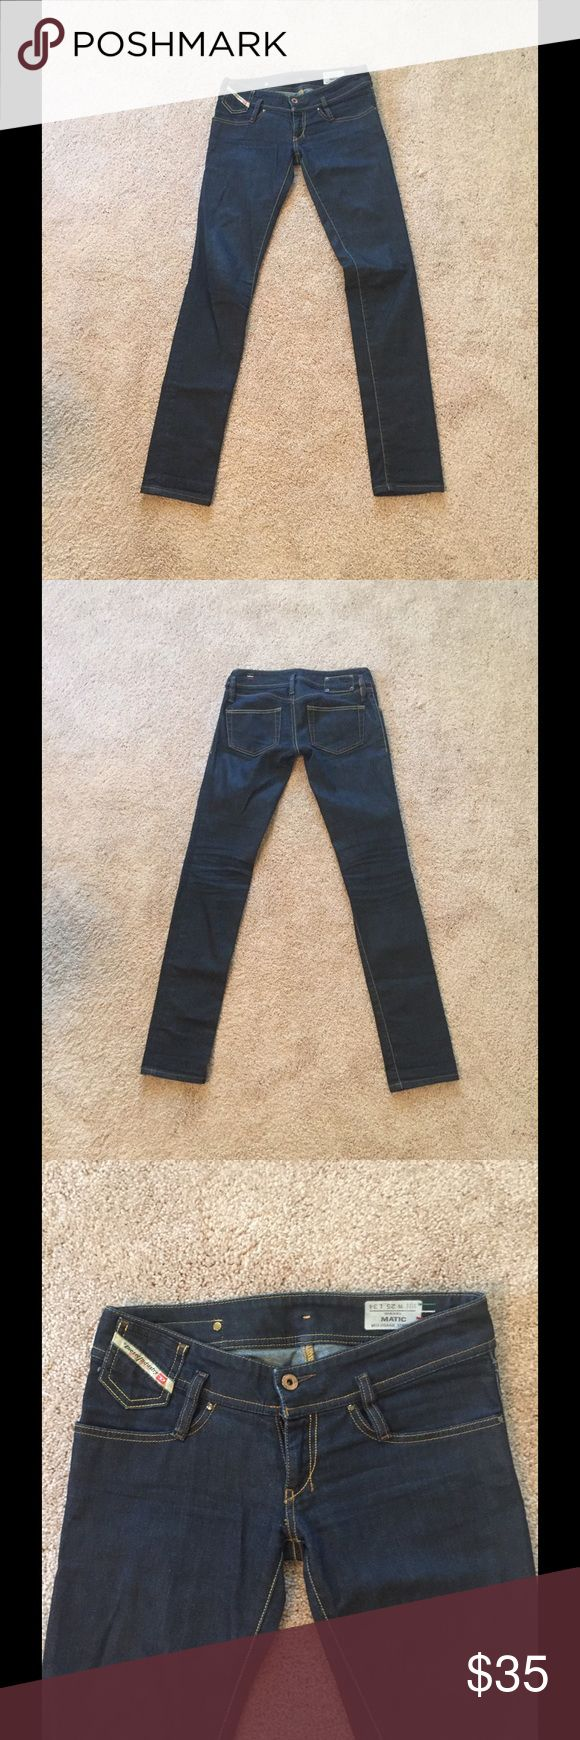 ⚡FLASH SALE⚡ Diesel Matic Stretch Jeans Dark wash, skinny, five pocket style, 98% cotton, 2% elastane. Hand wash. Diesel Jeans Skinny